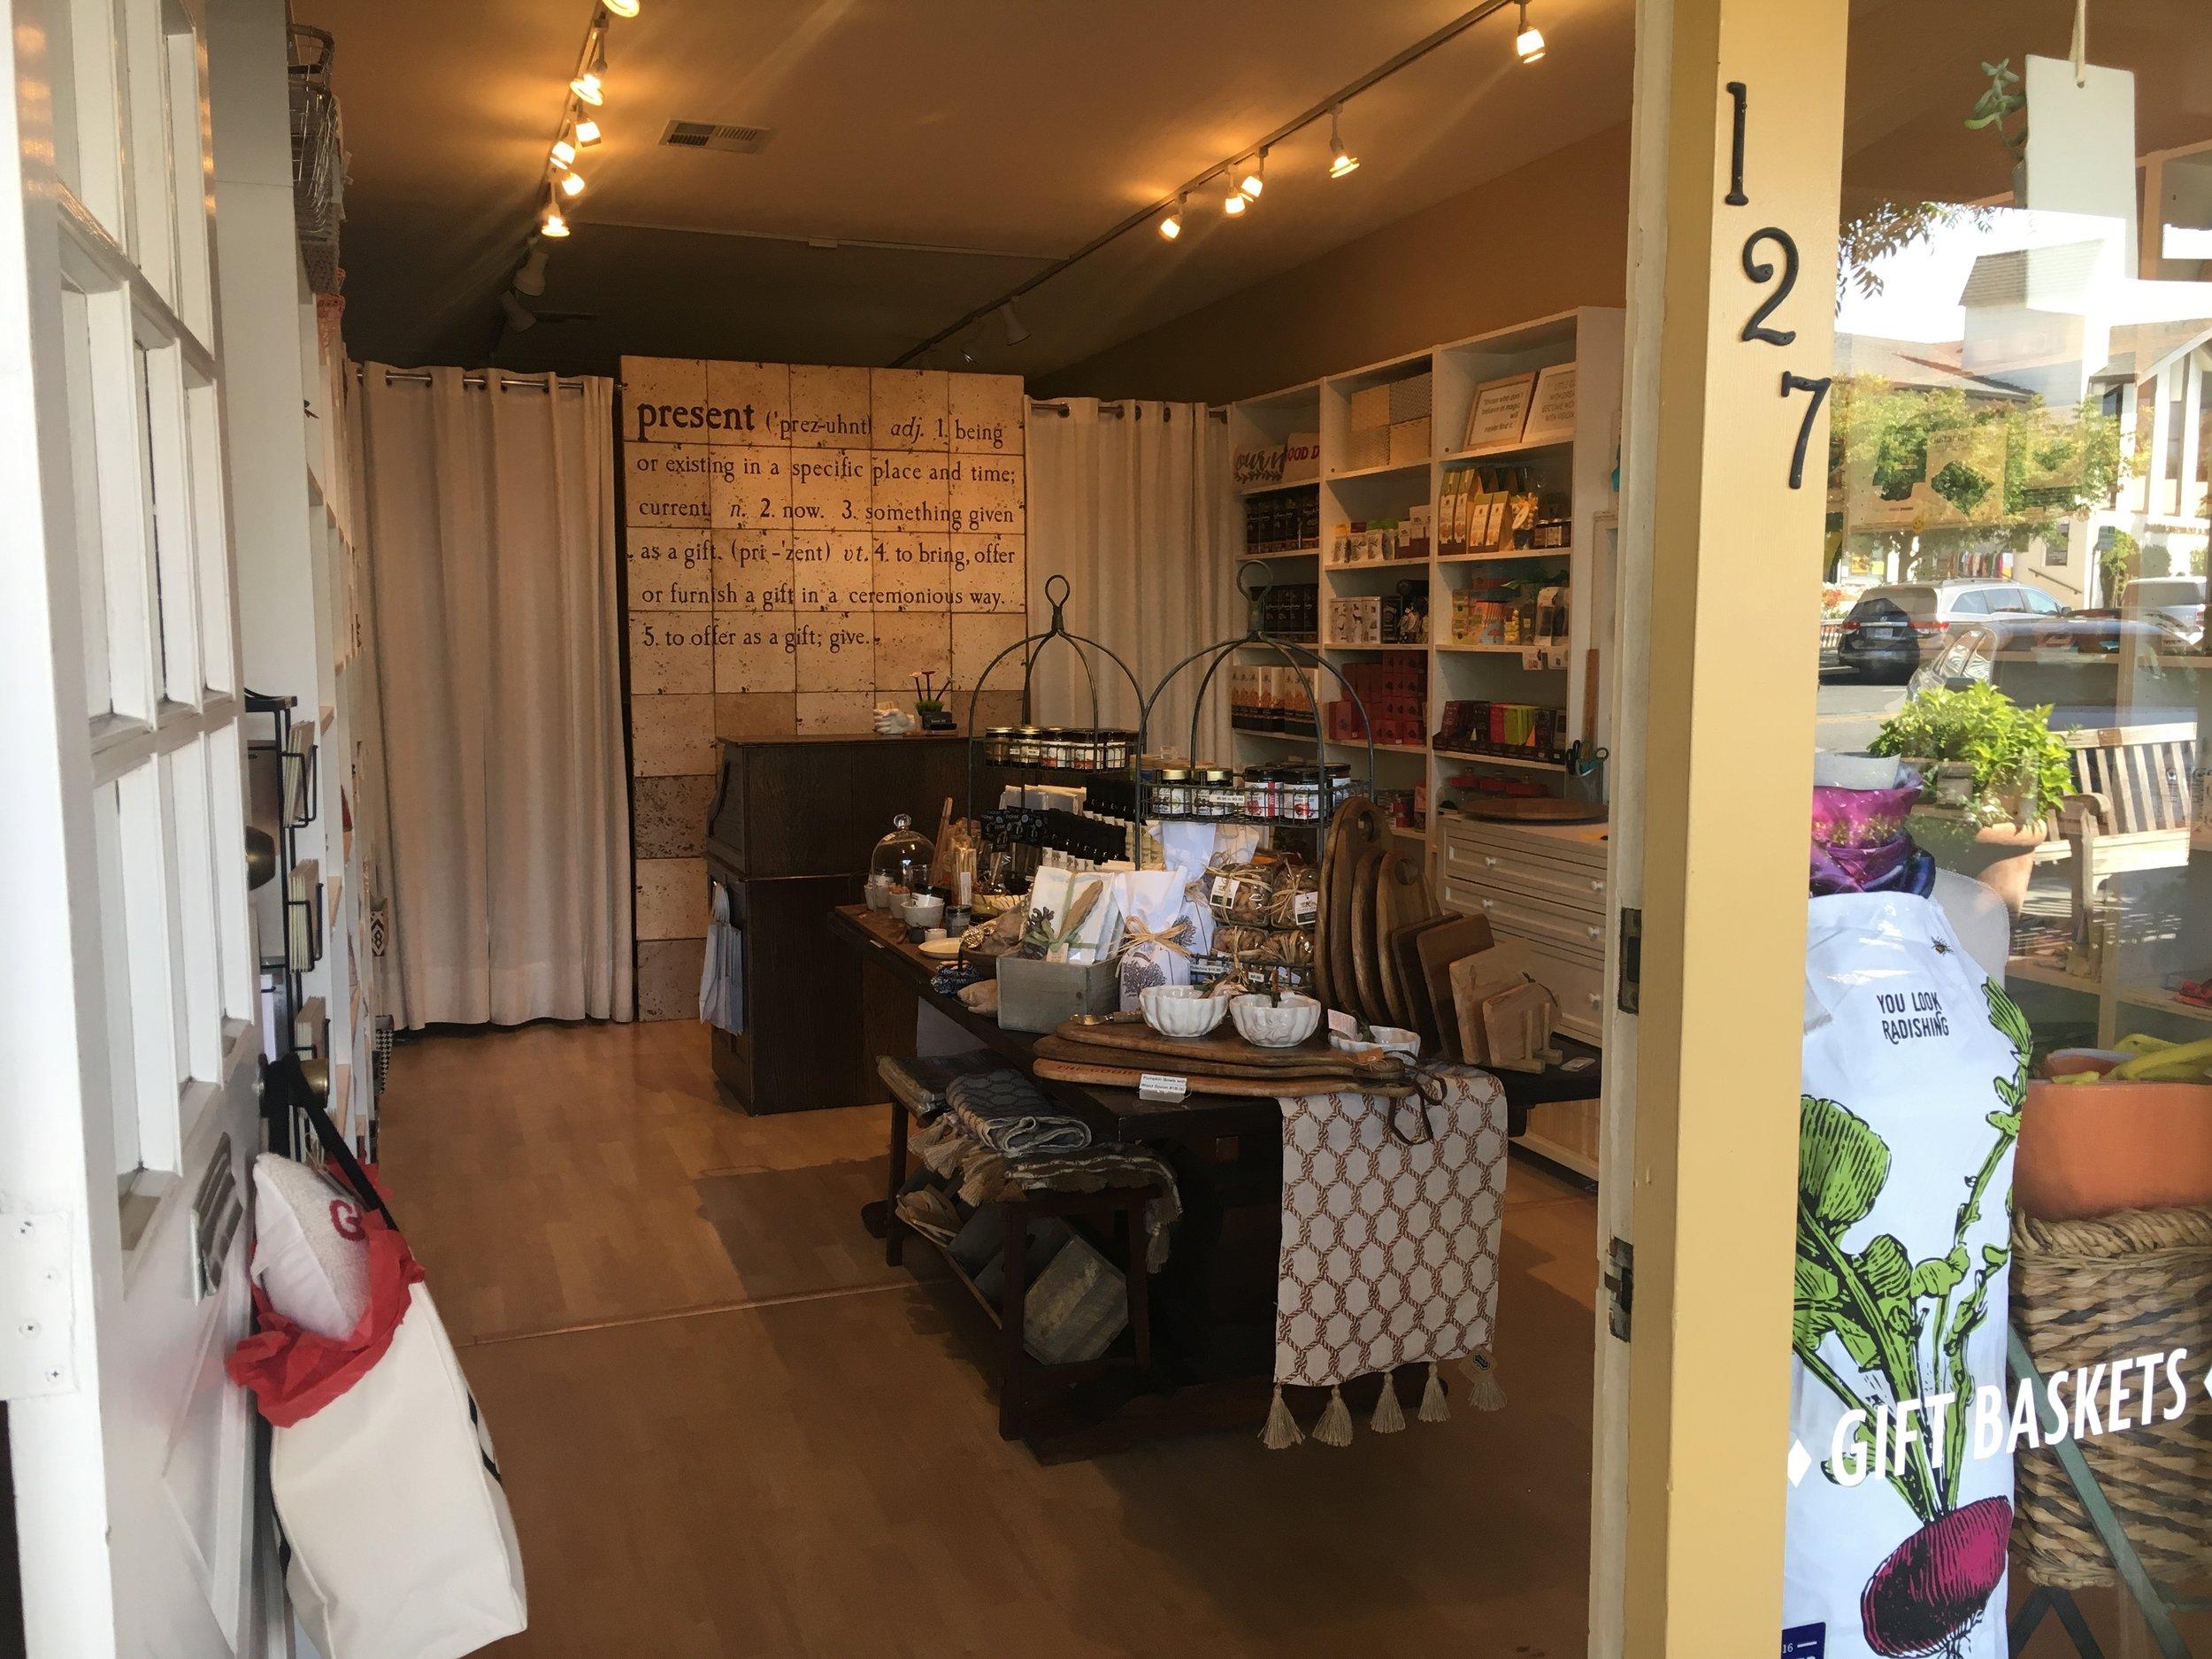 Present-shelves-stocked-090518.png